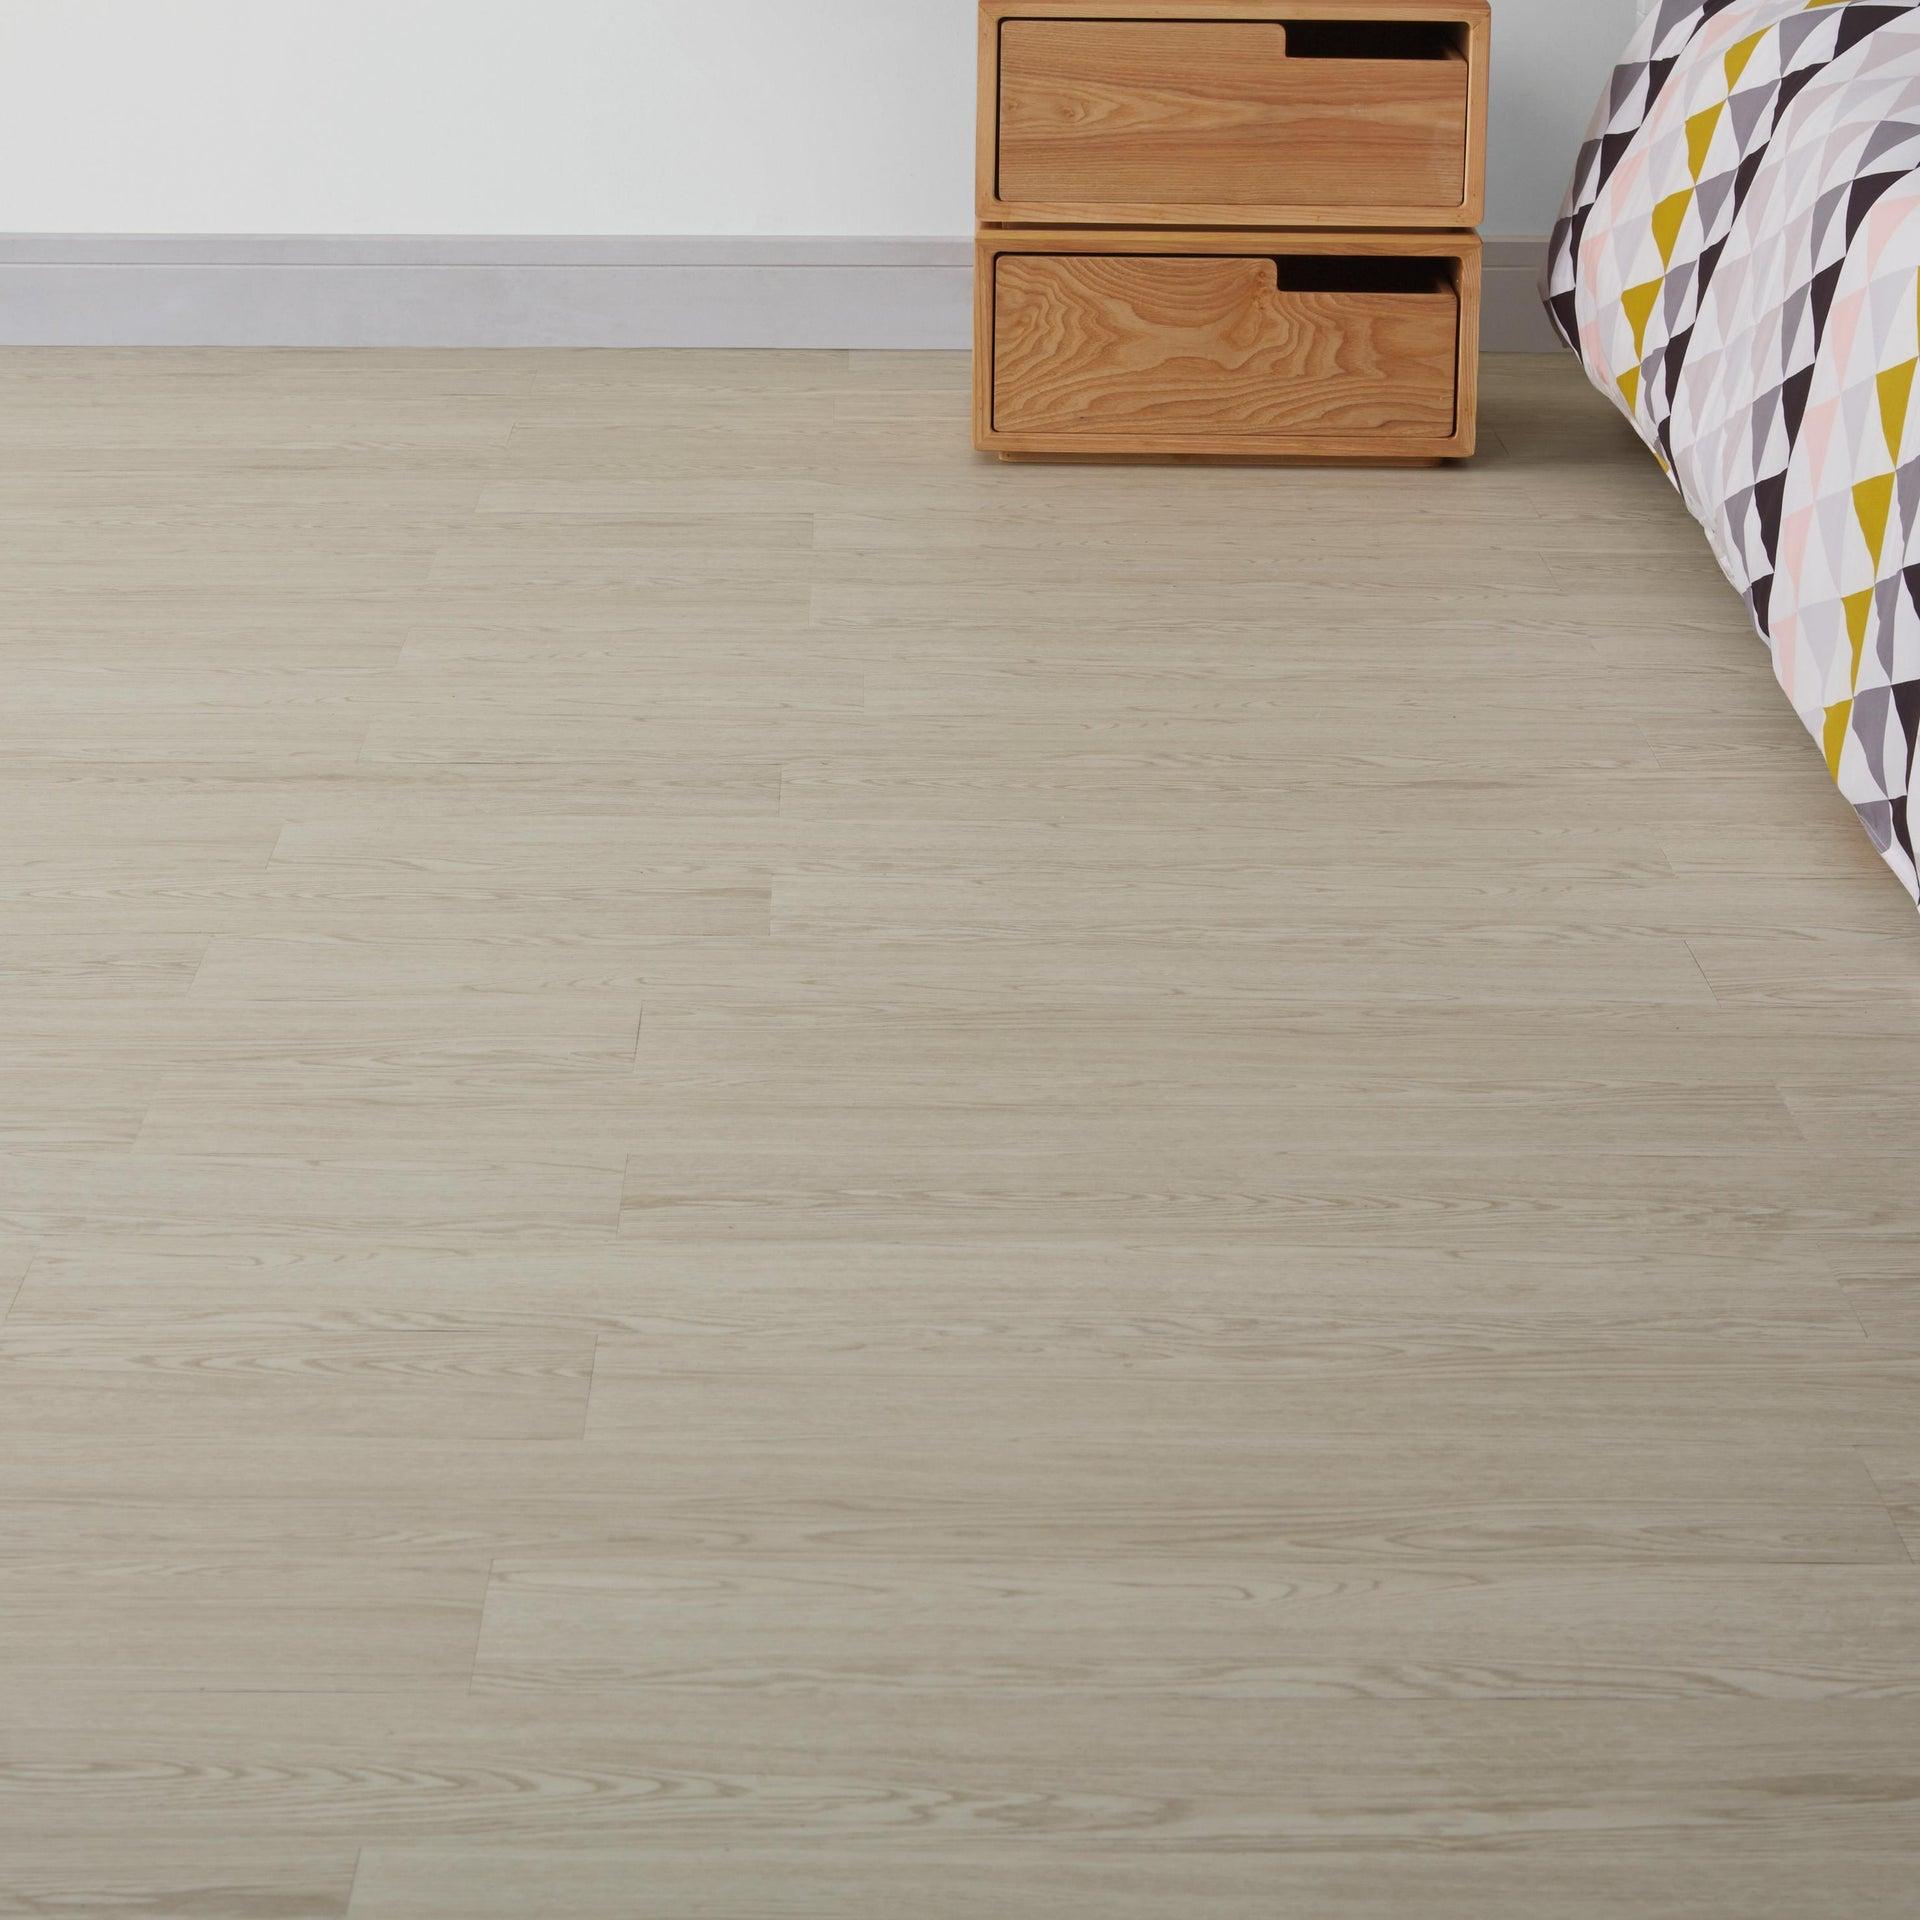 Pavimento PVC adesivo Whiwood Sp 1.8 mm bianco - 1